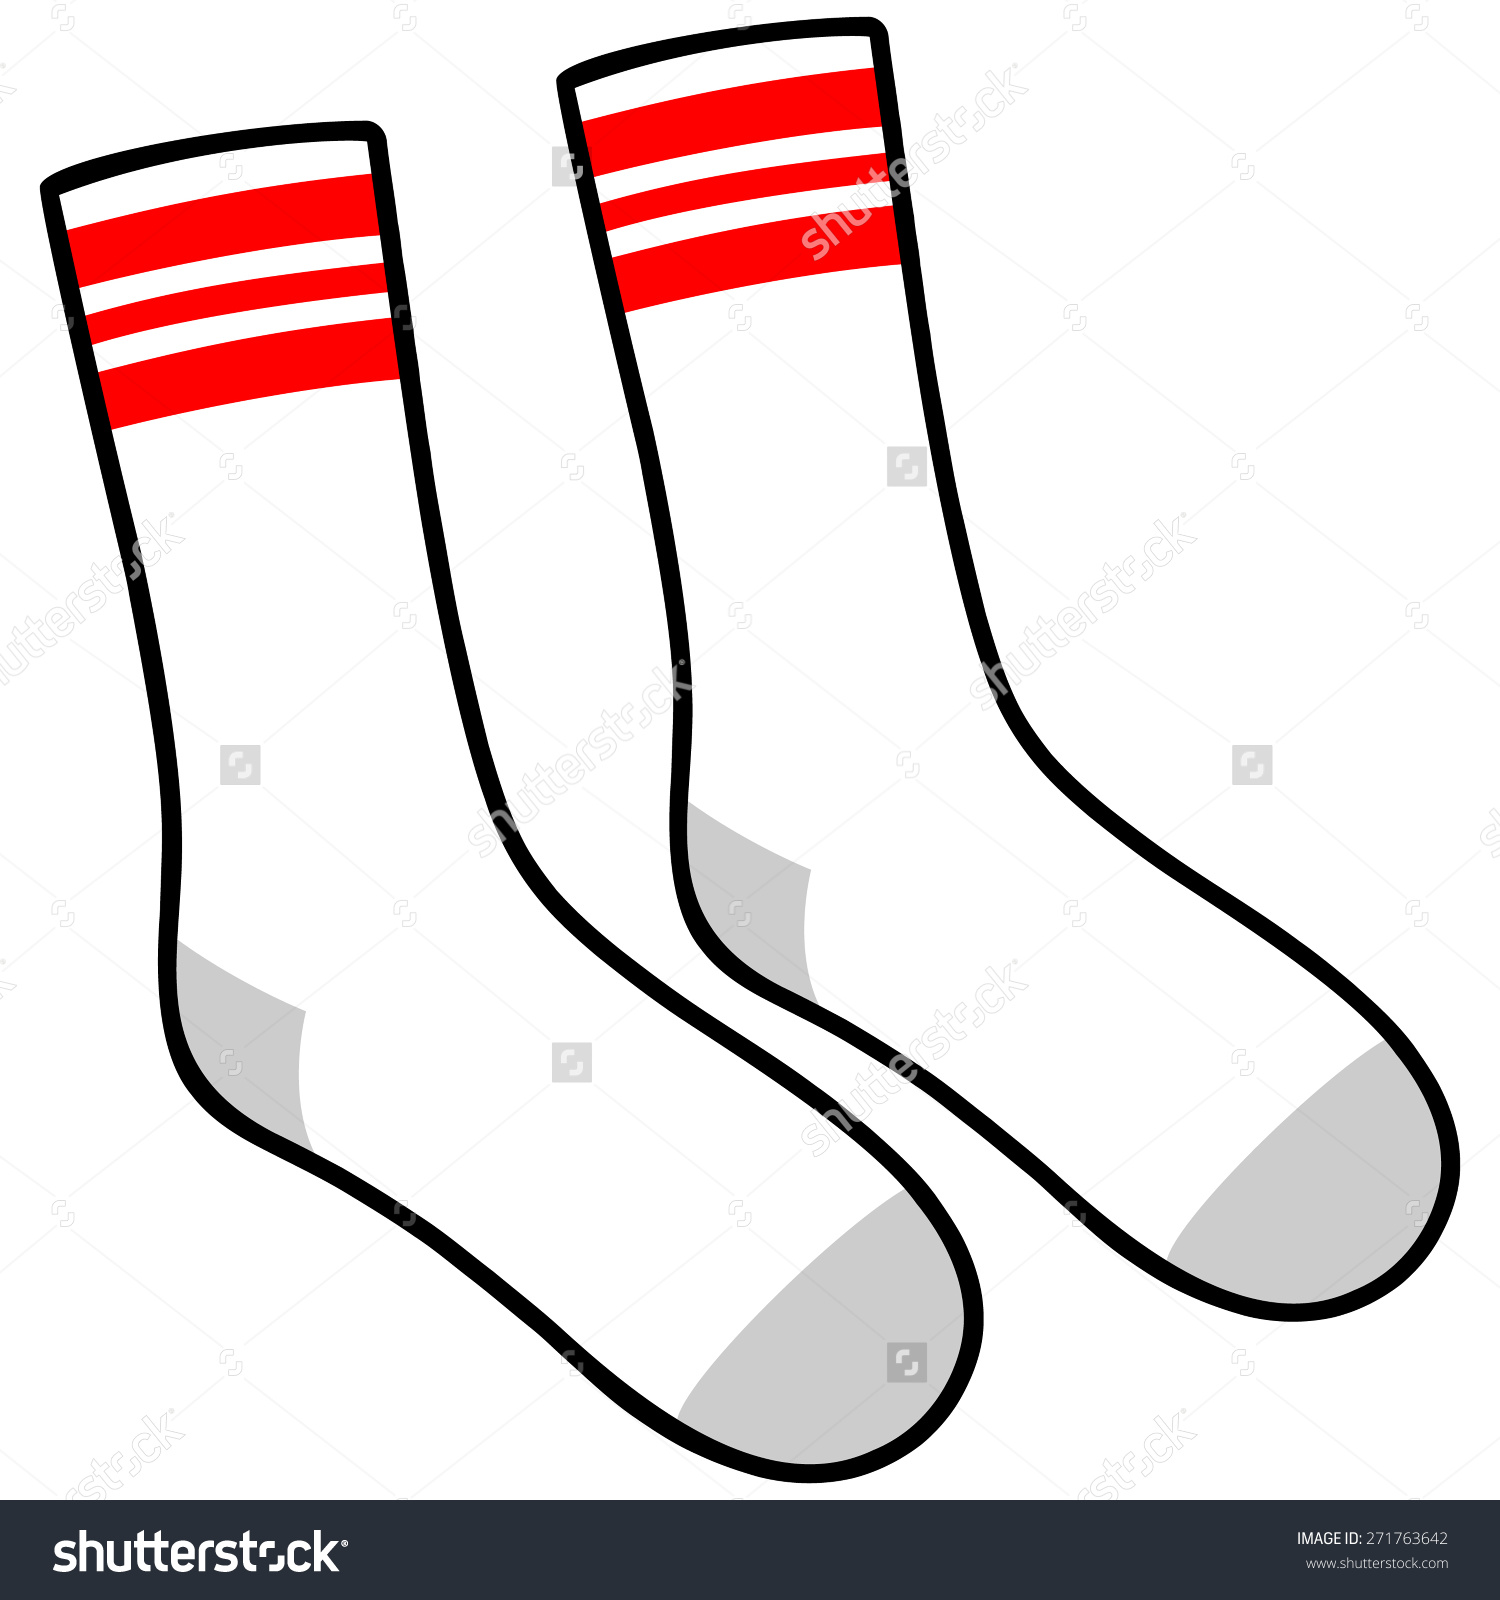 Sock Template Vector at GetDrawings com | Free for personal